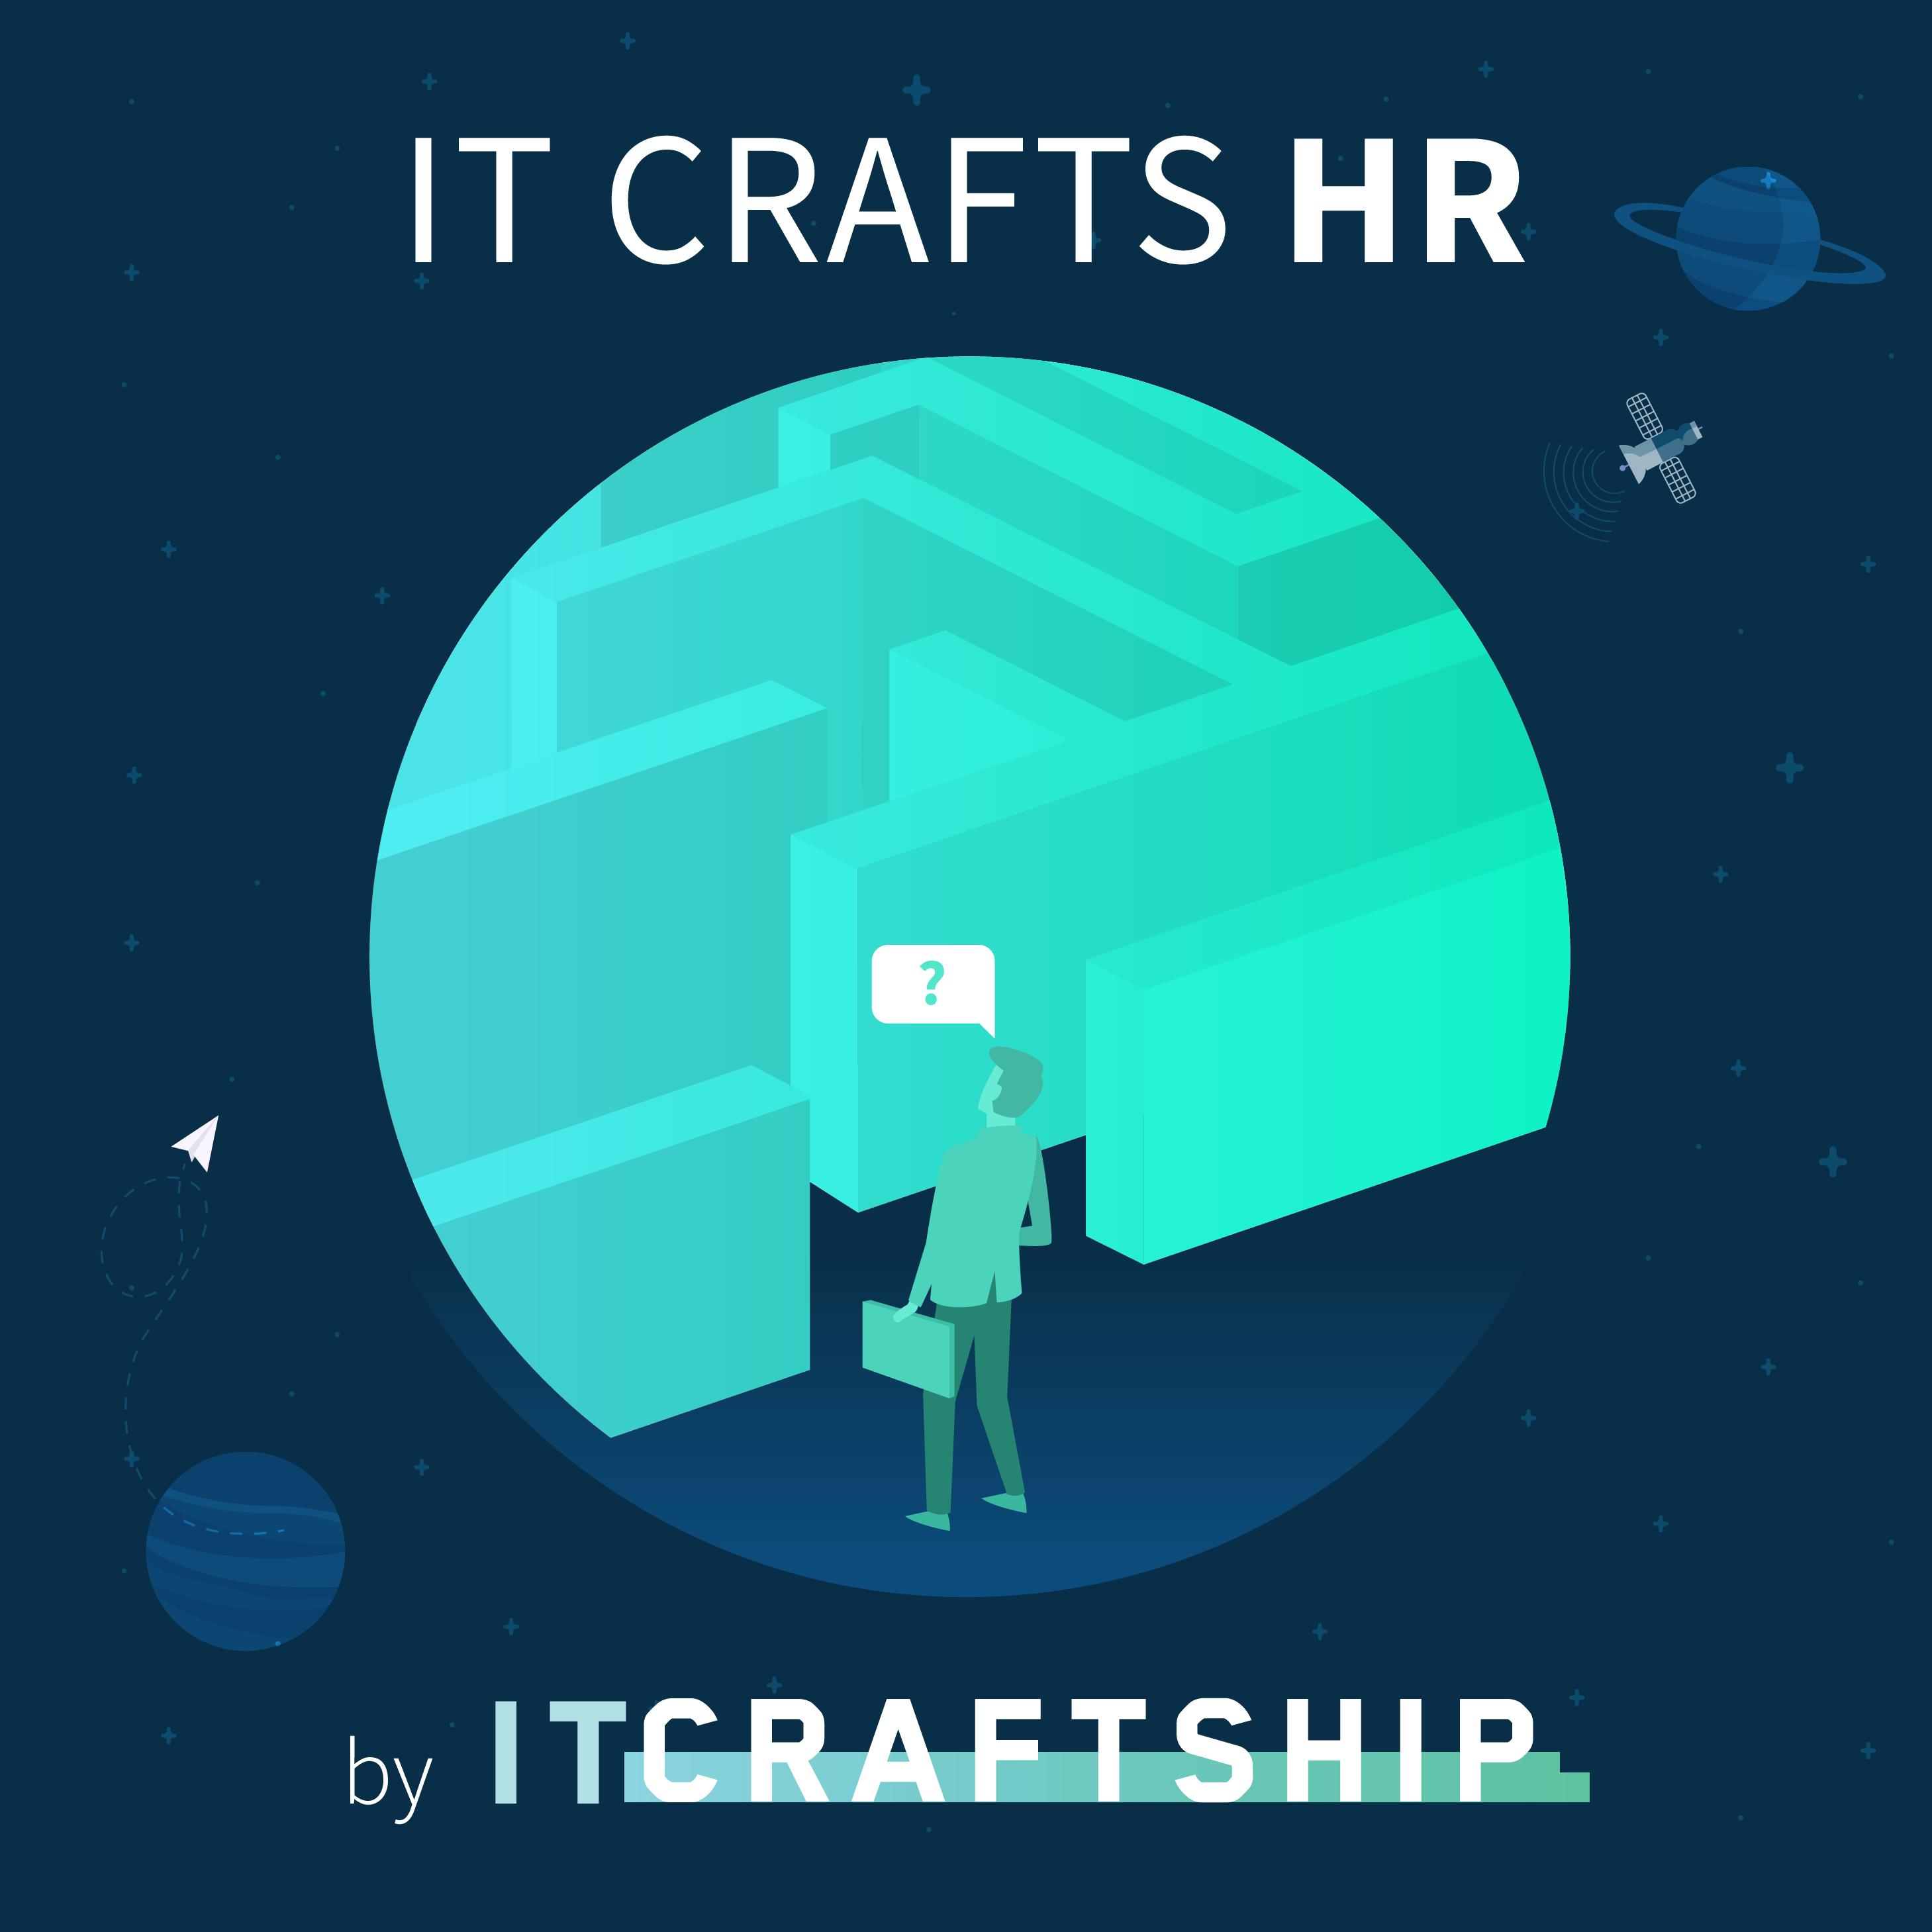 IT Crafts HR show image